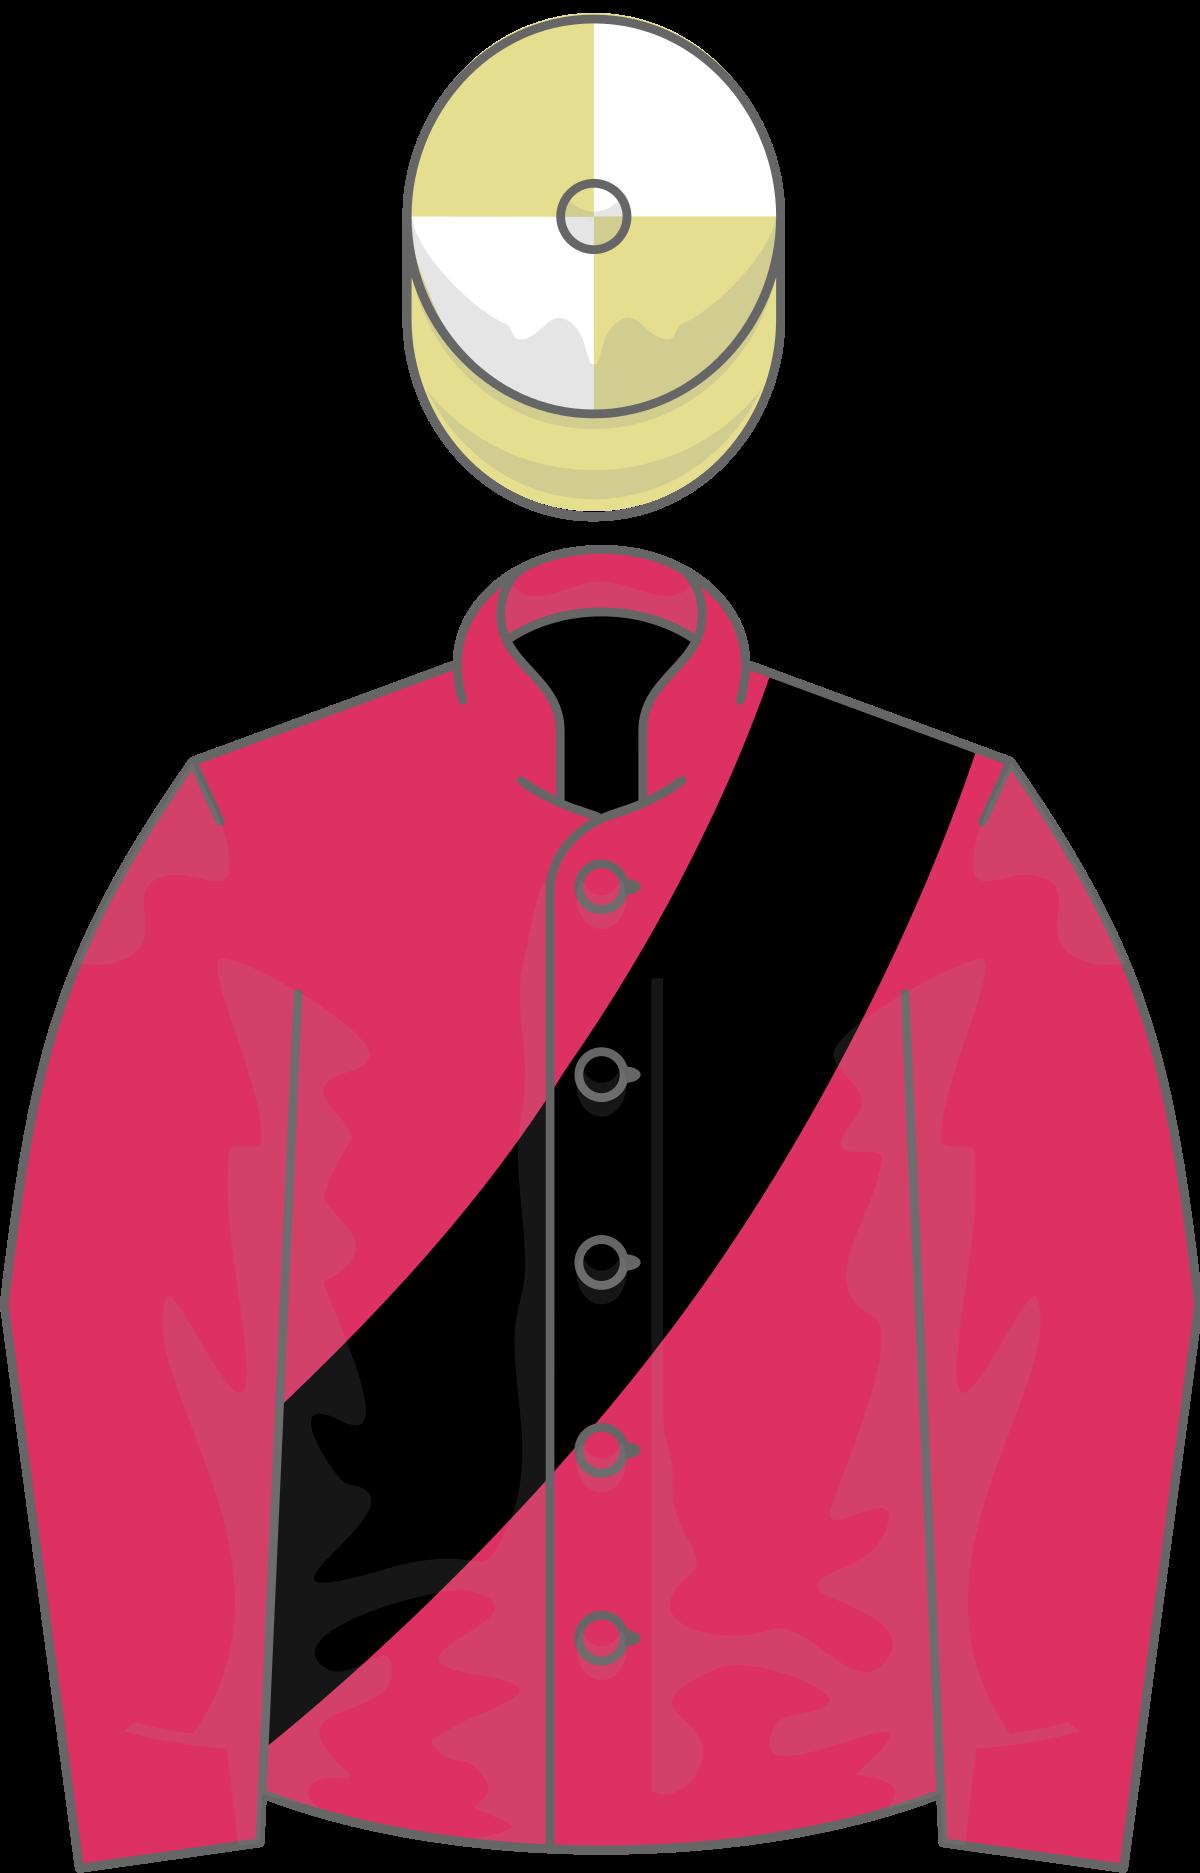 Time charter wikipedia . Pilgrim clipart collar